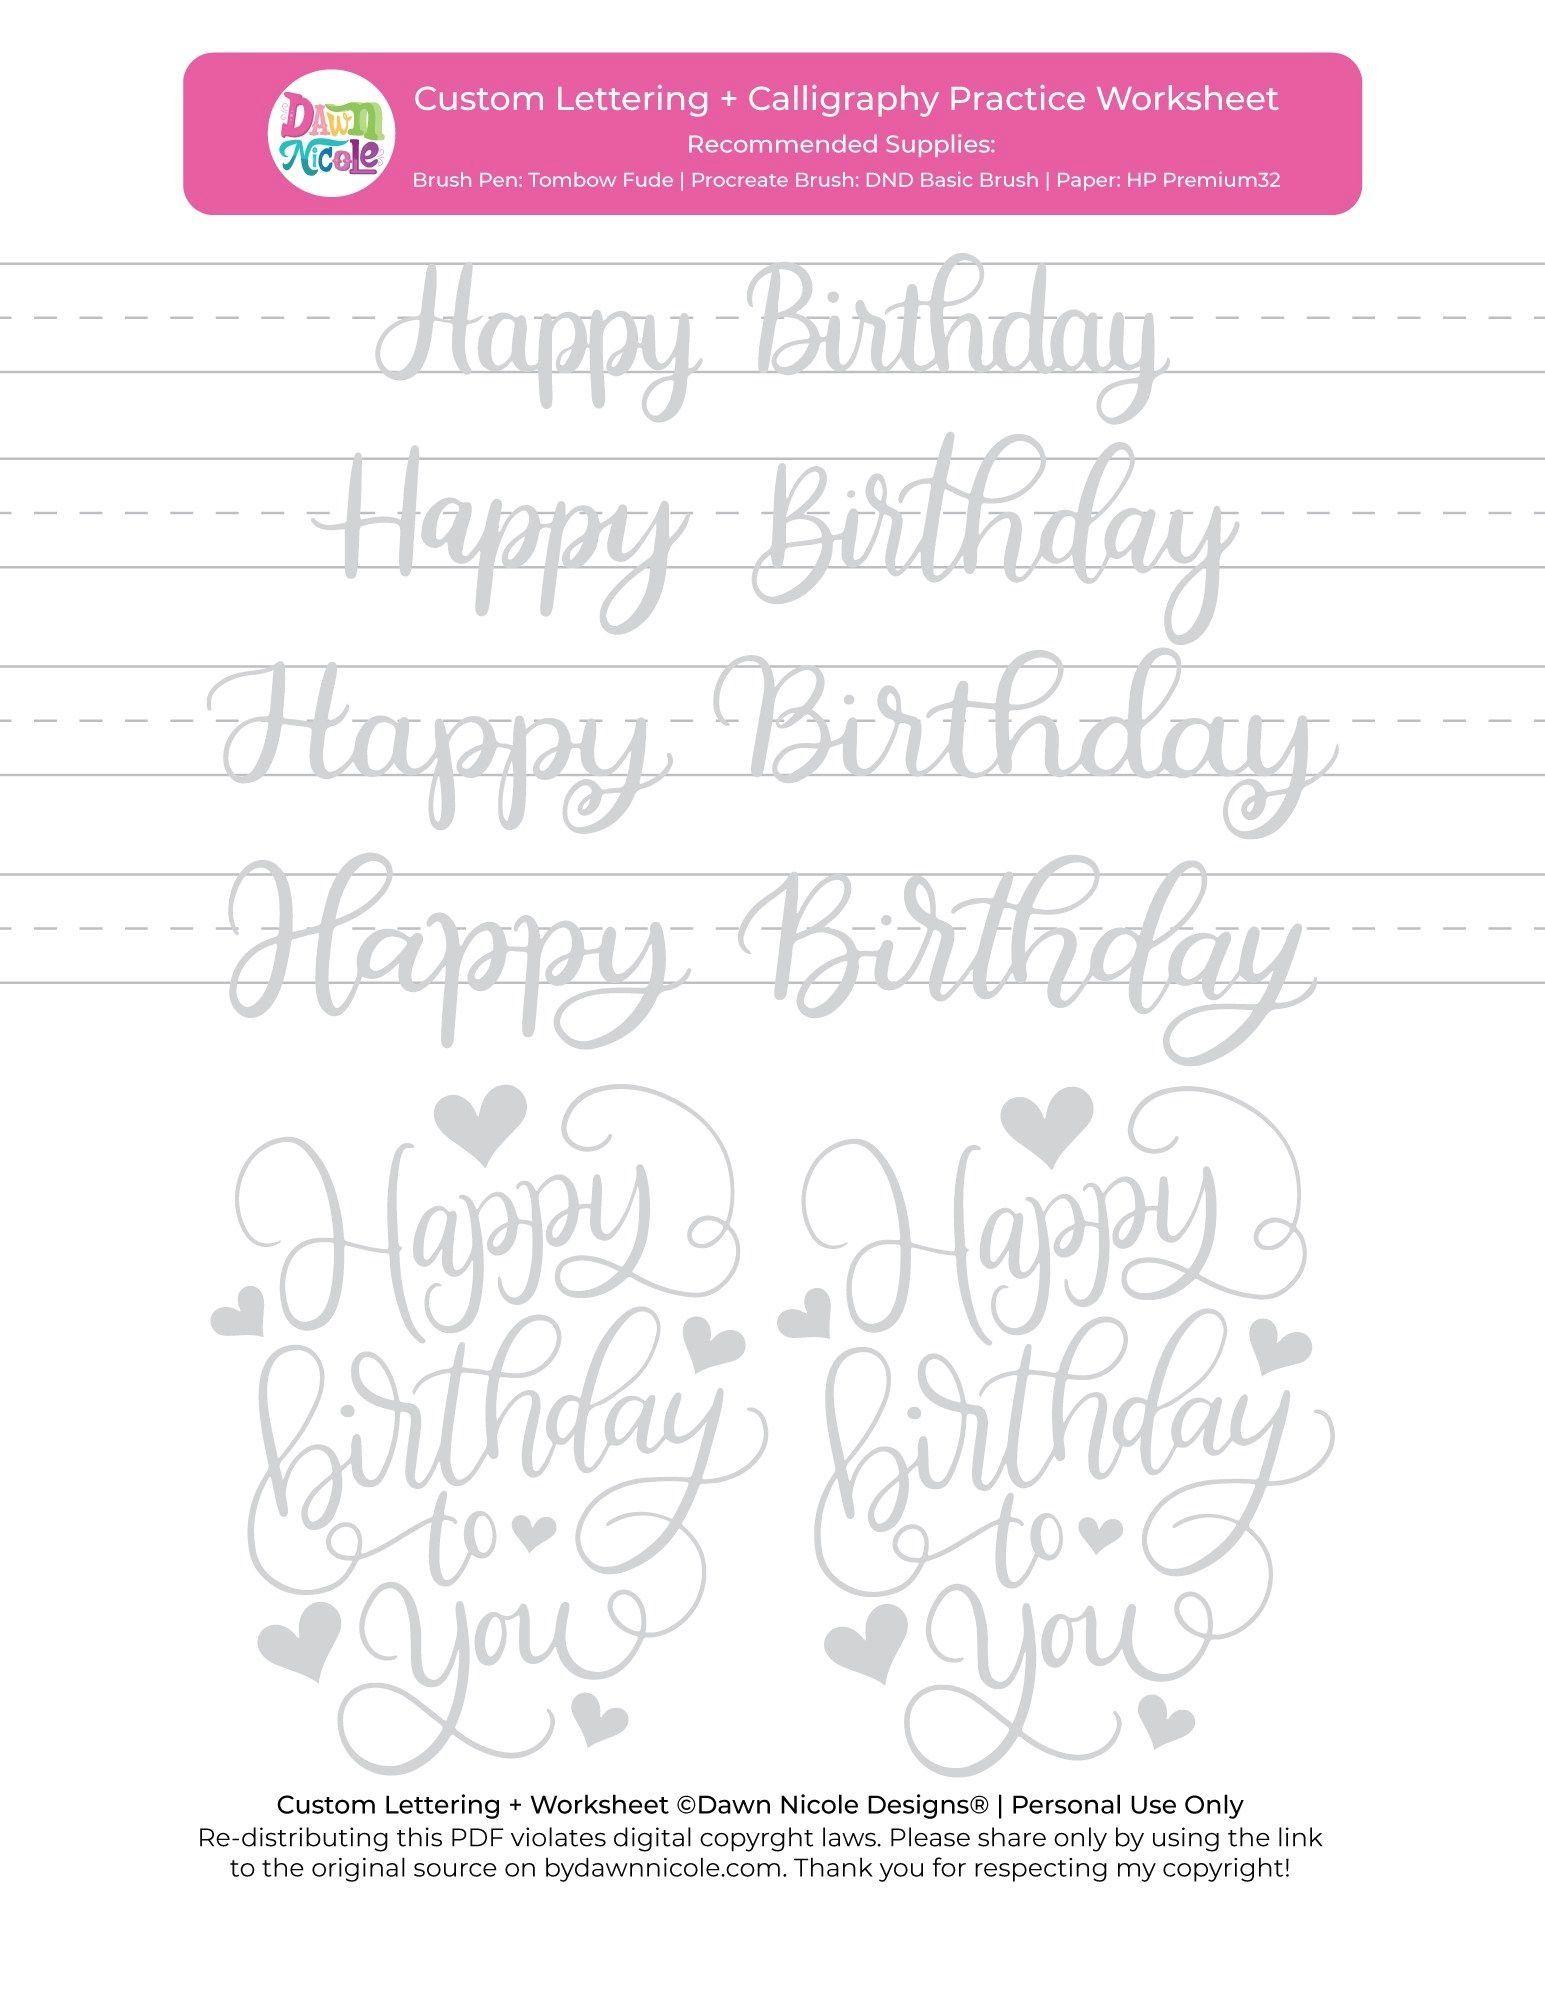 Happy Birthday Brush Calligraphy Practice Sheets